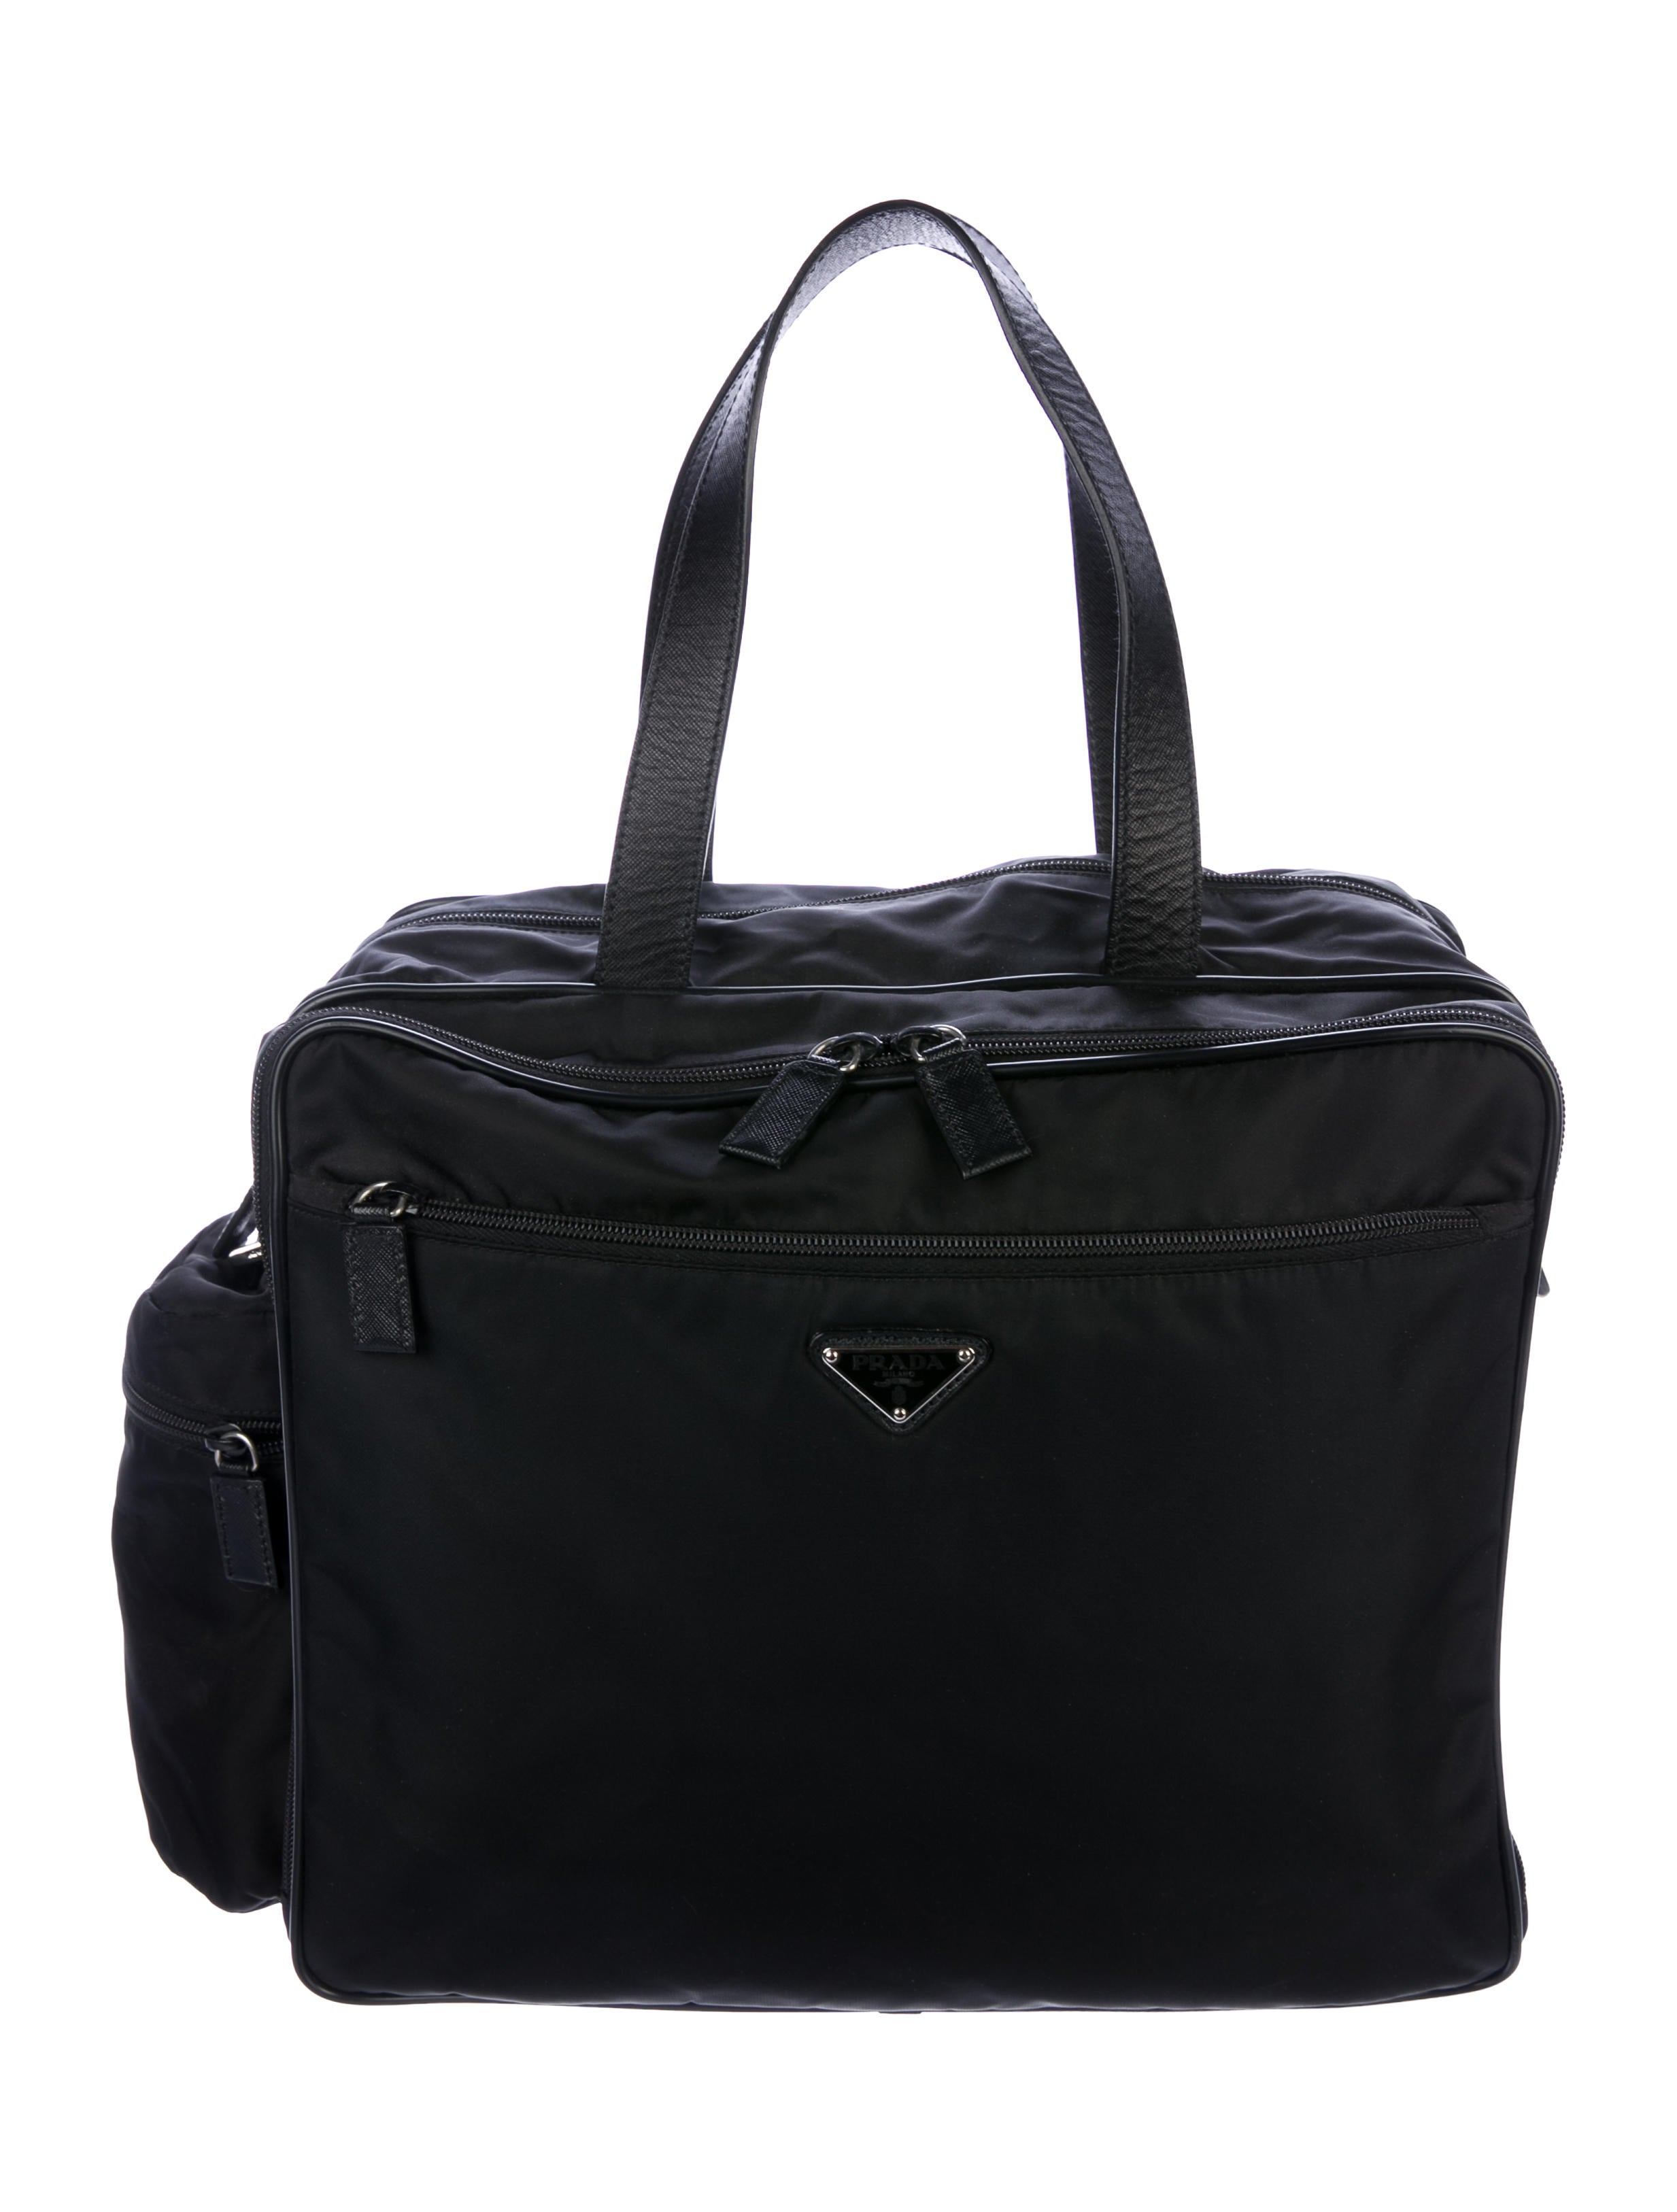 93839ec3bb9a Prada Tessuto Diaper Bag - Handbags - PRA247556   The RealReal